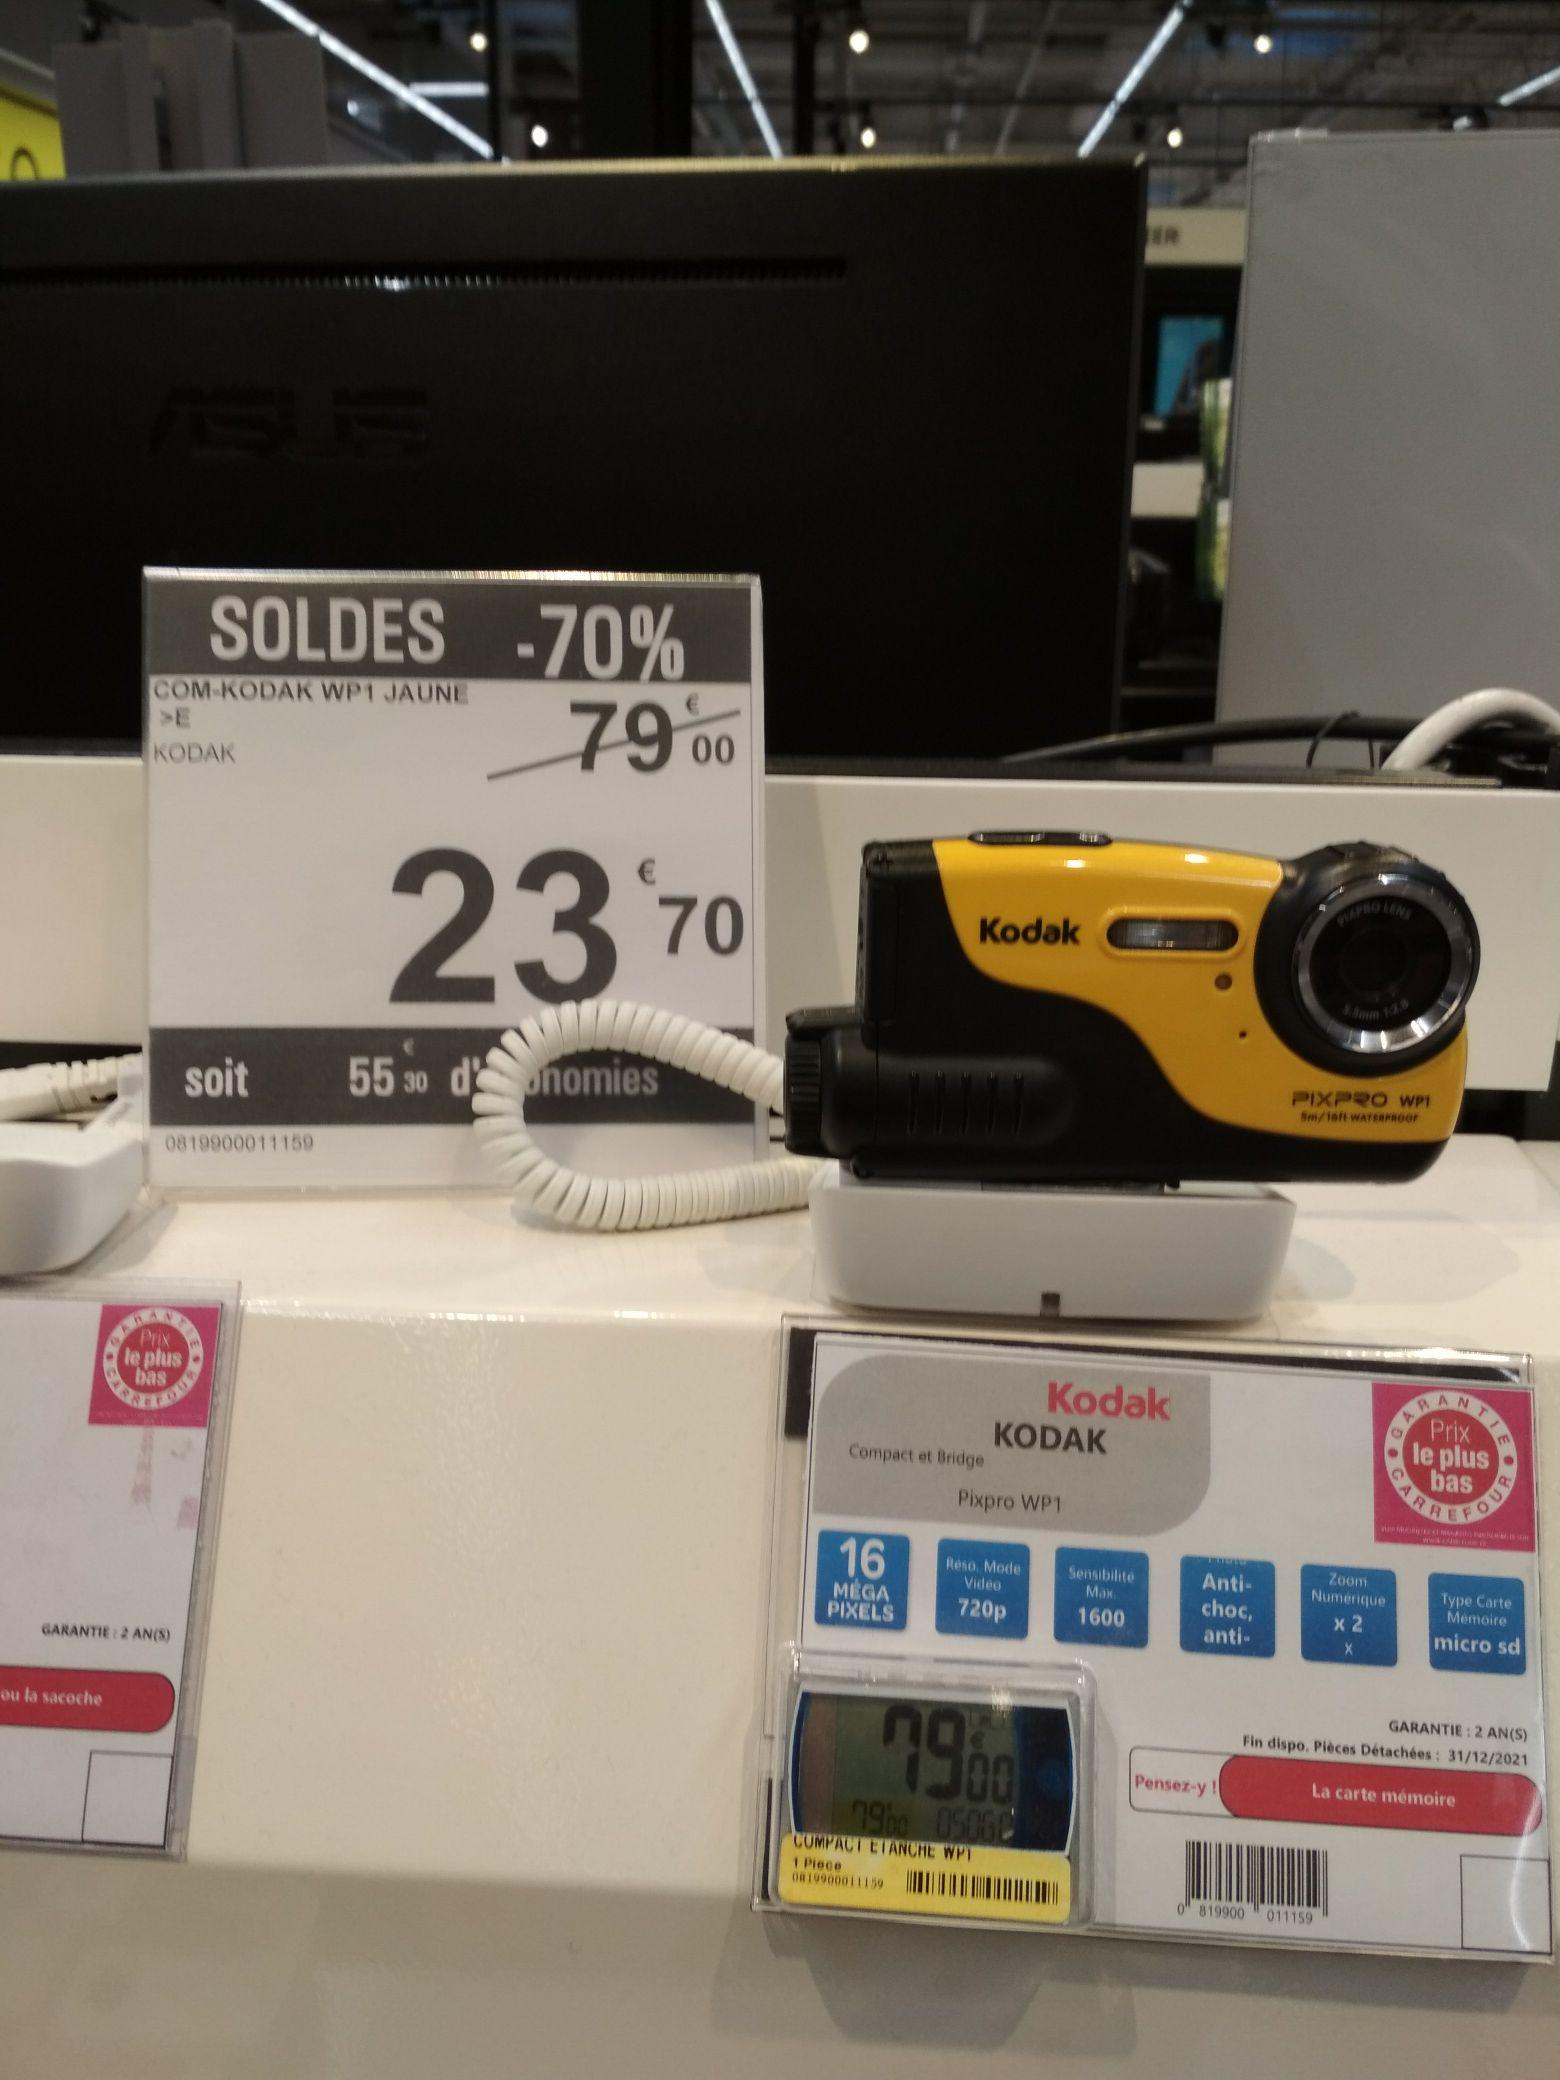 Kodak wp1 jaune - Compiègne (60)